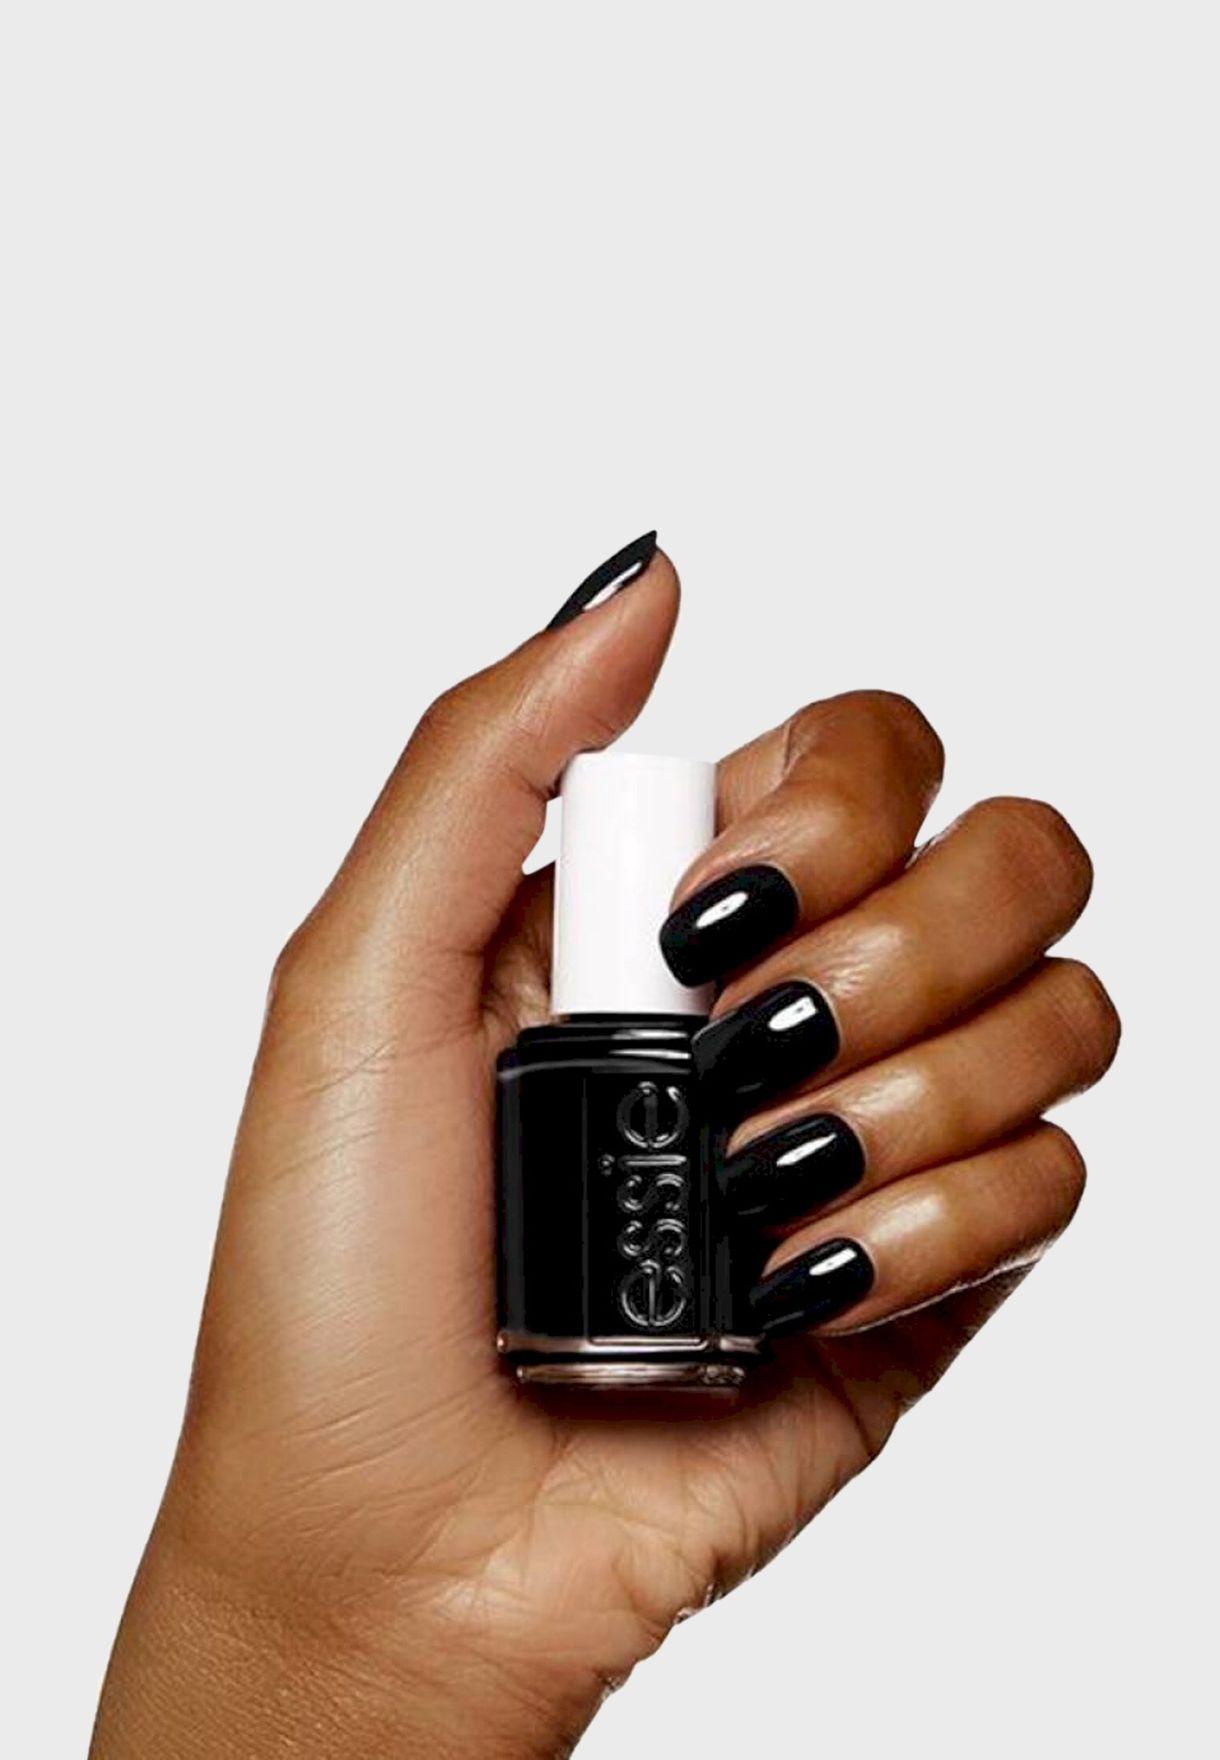 Nail Polish - Licorice